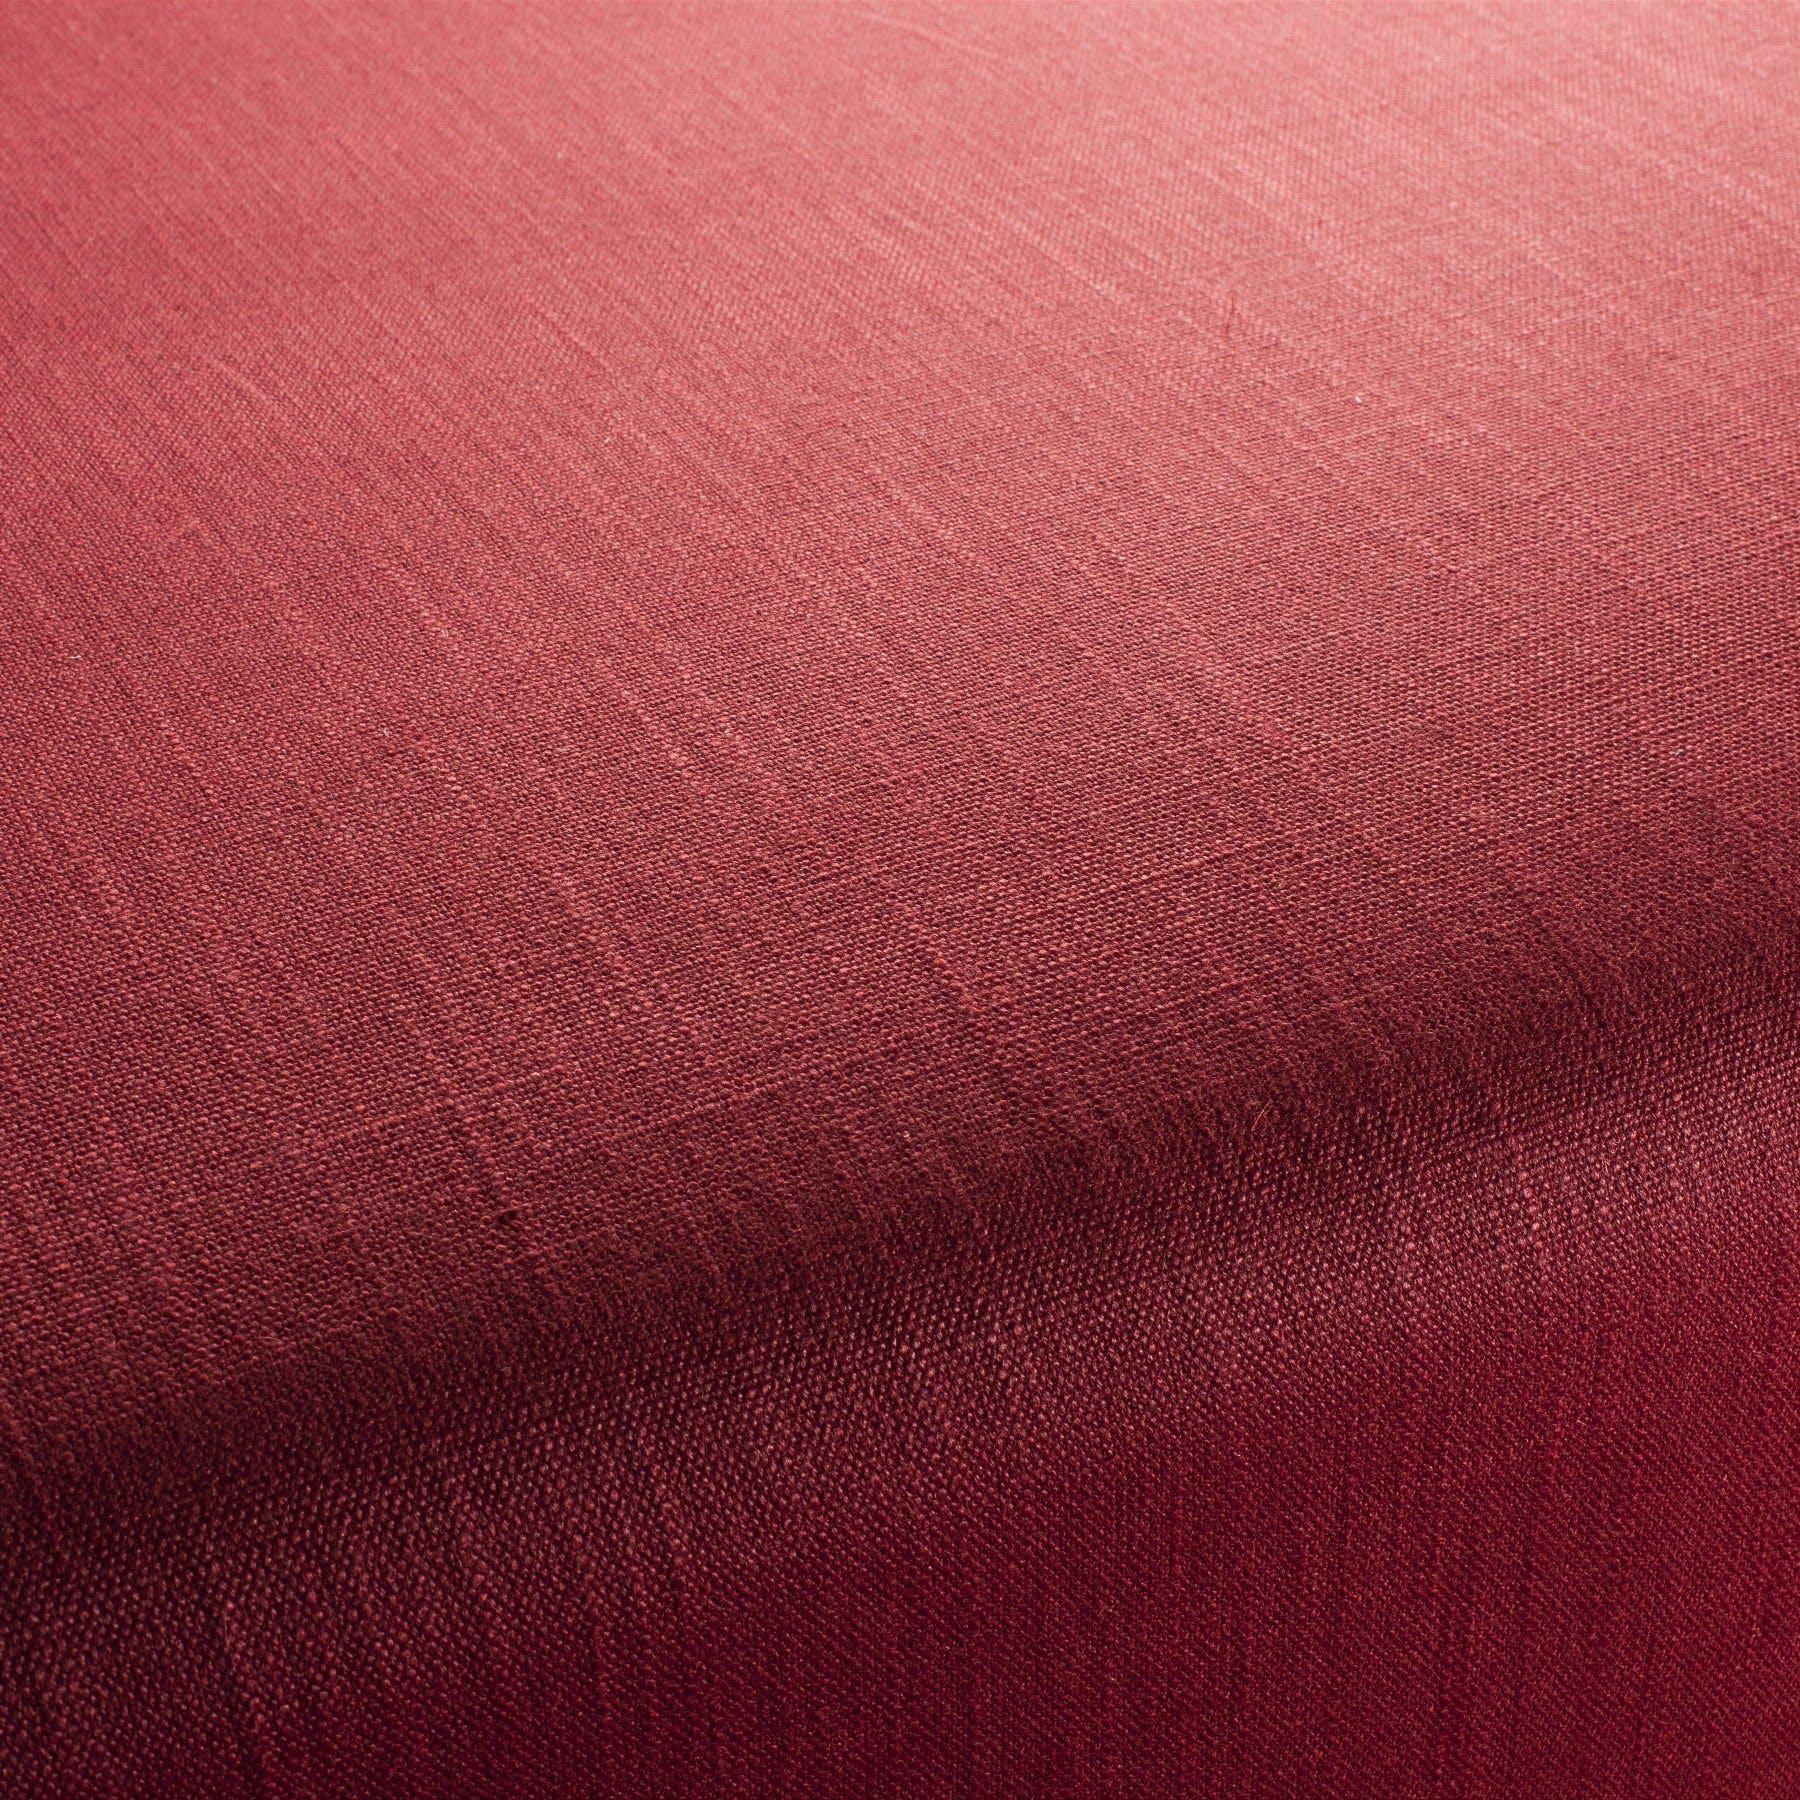 Jab-anstoetz-fabrics-red-tango-vol-2-upholstery-haute-living